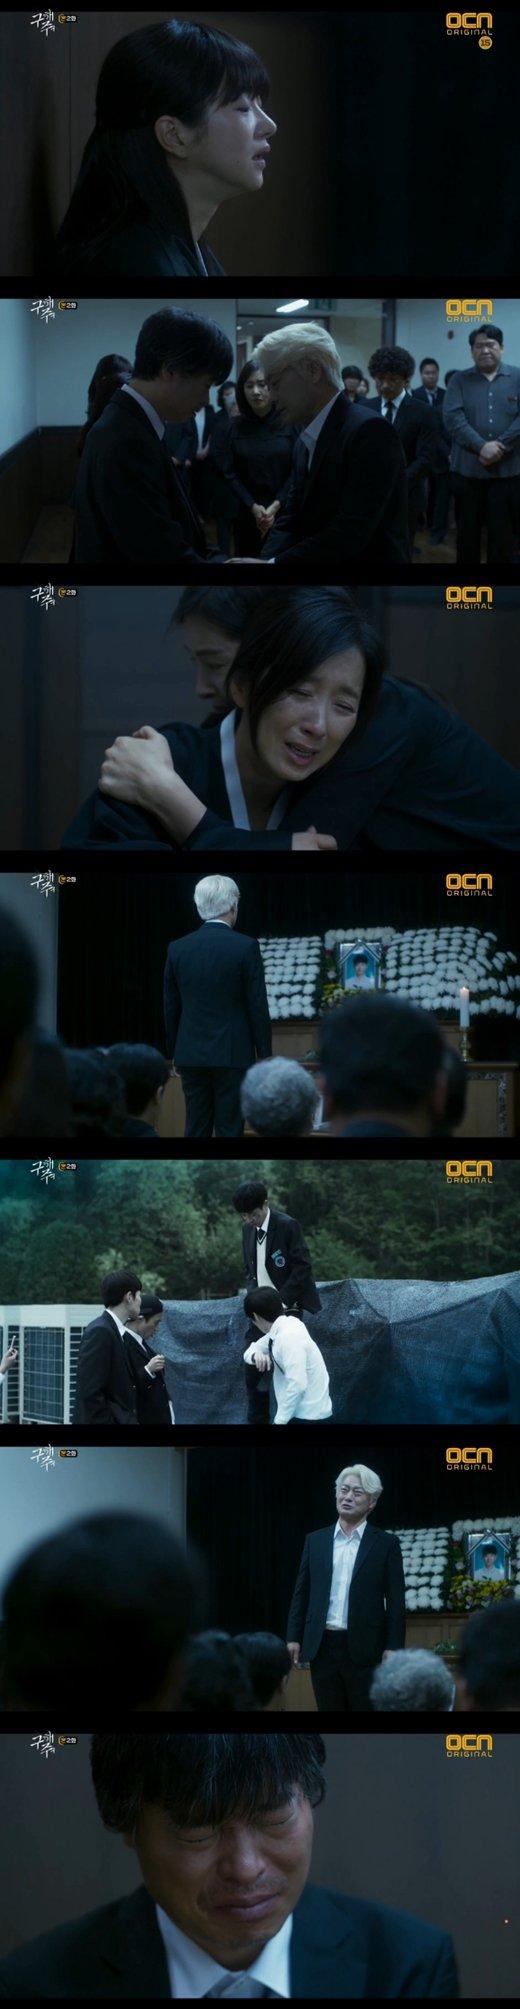 "[Spoiler] ""Save Me"" Seo Ye-ji's brother dies"